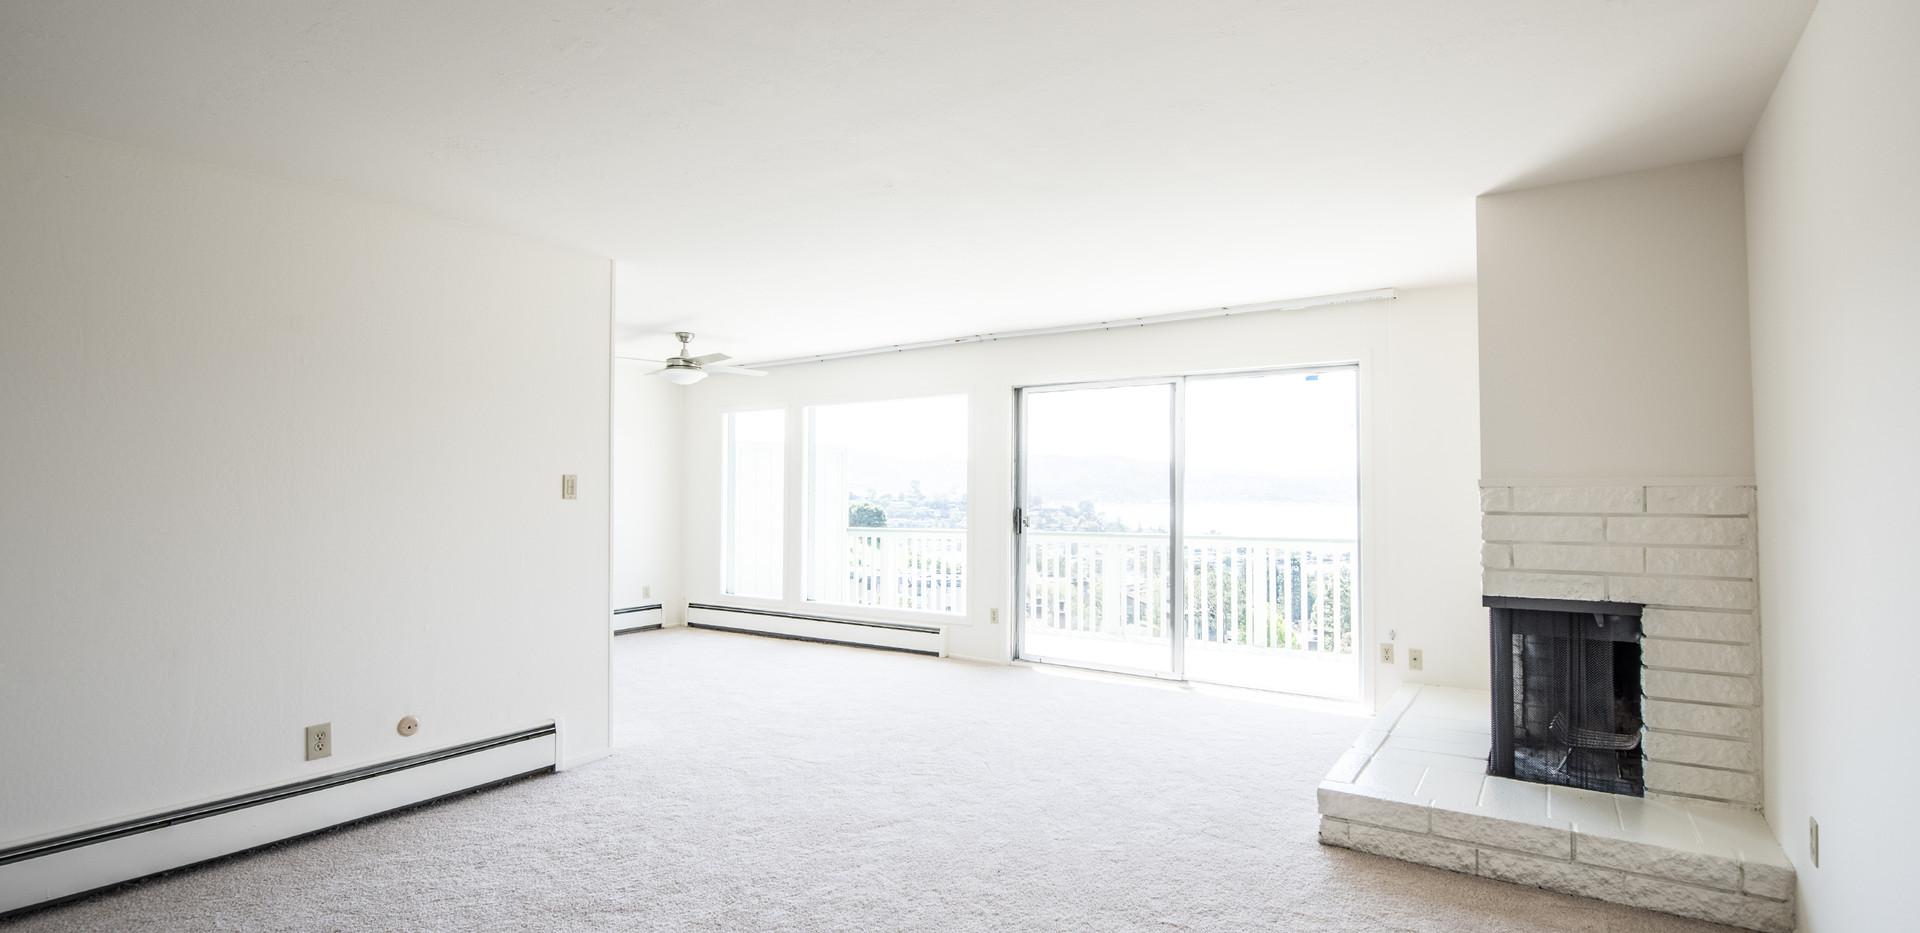 21 Marinero 305 Living Room 2.jpg